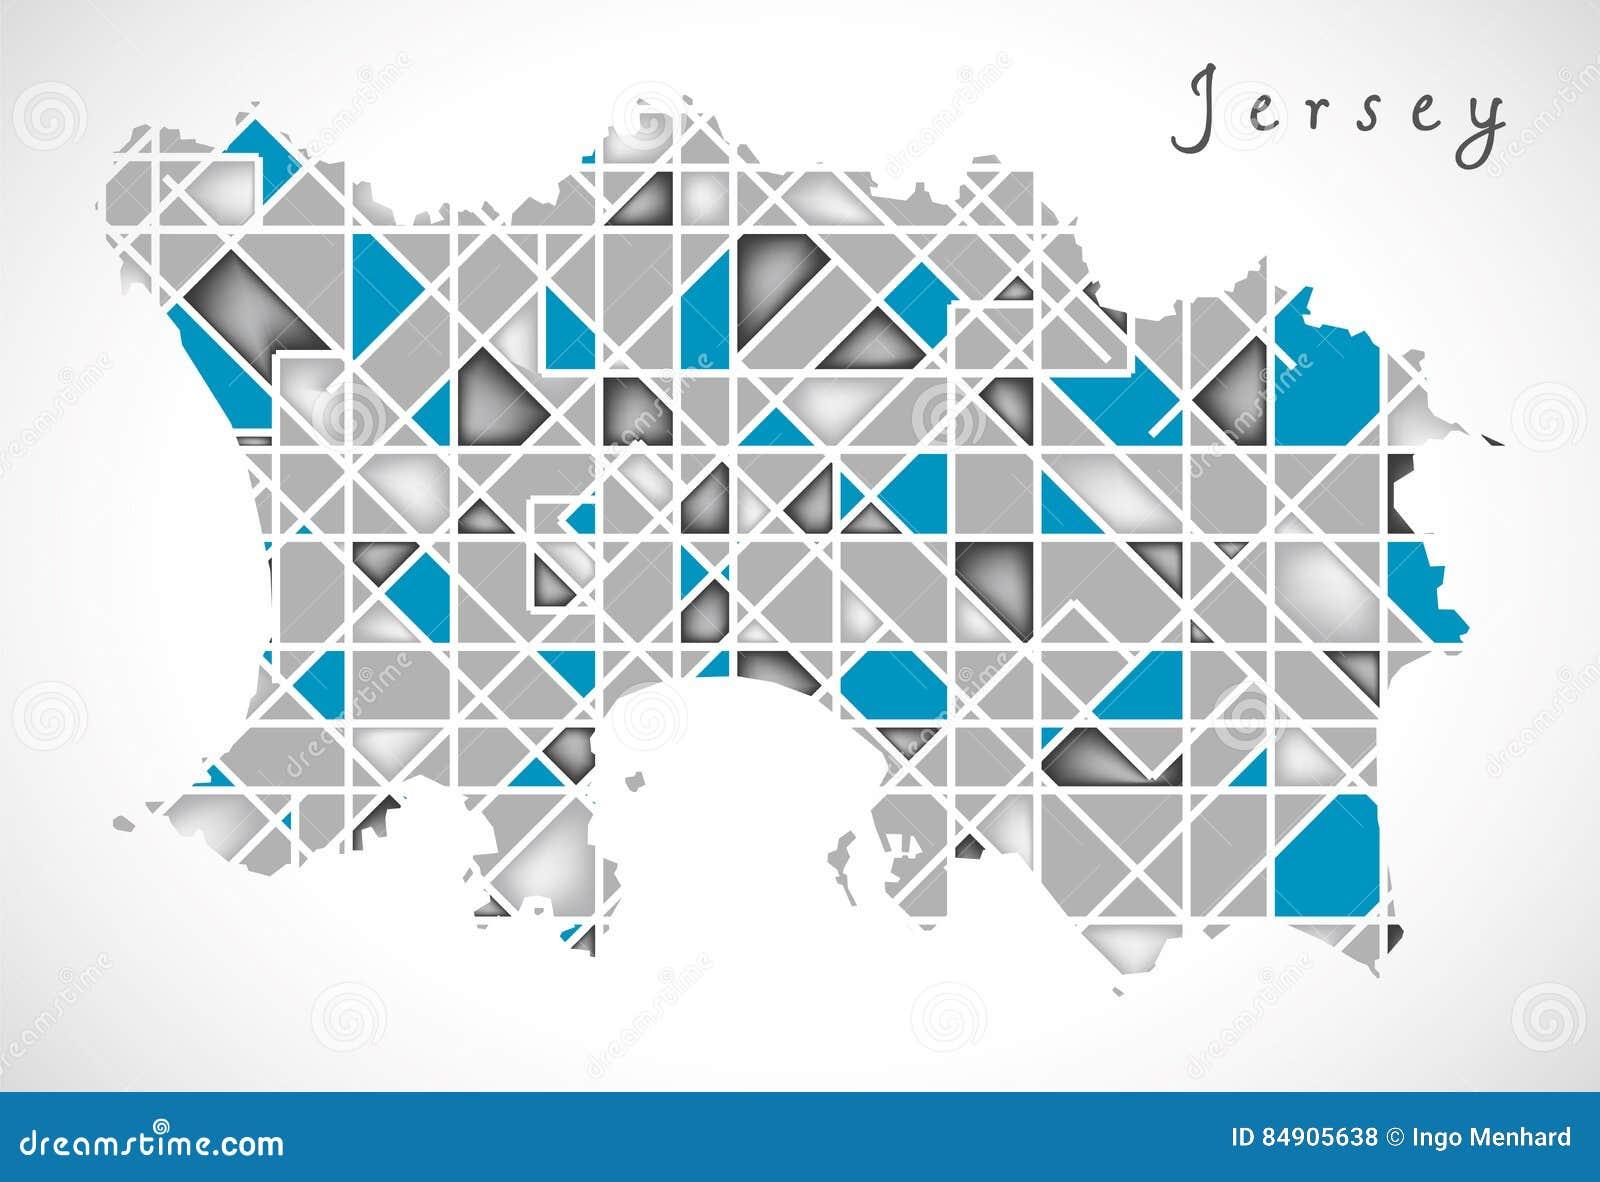 Jersey Map Crystal Diamond Style Artwork Stock Illustration ... on